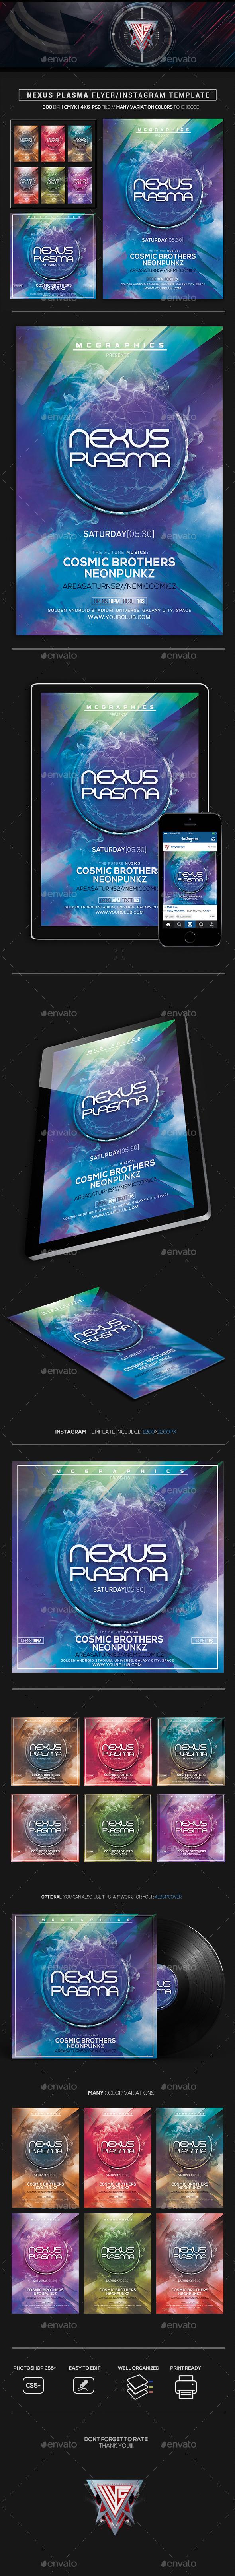 Nexus Plasma Flyer/Instagram Template - Flyers Print Templates